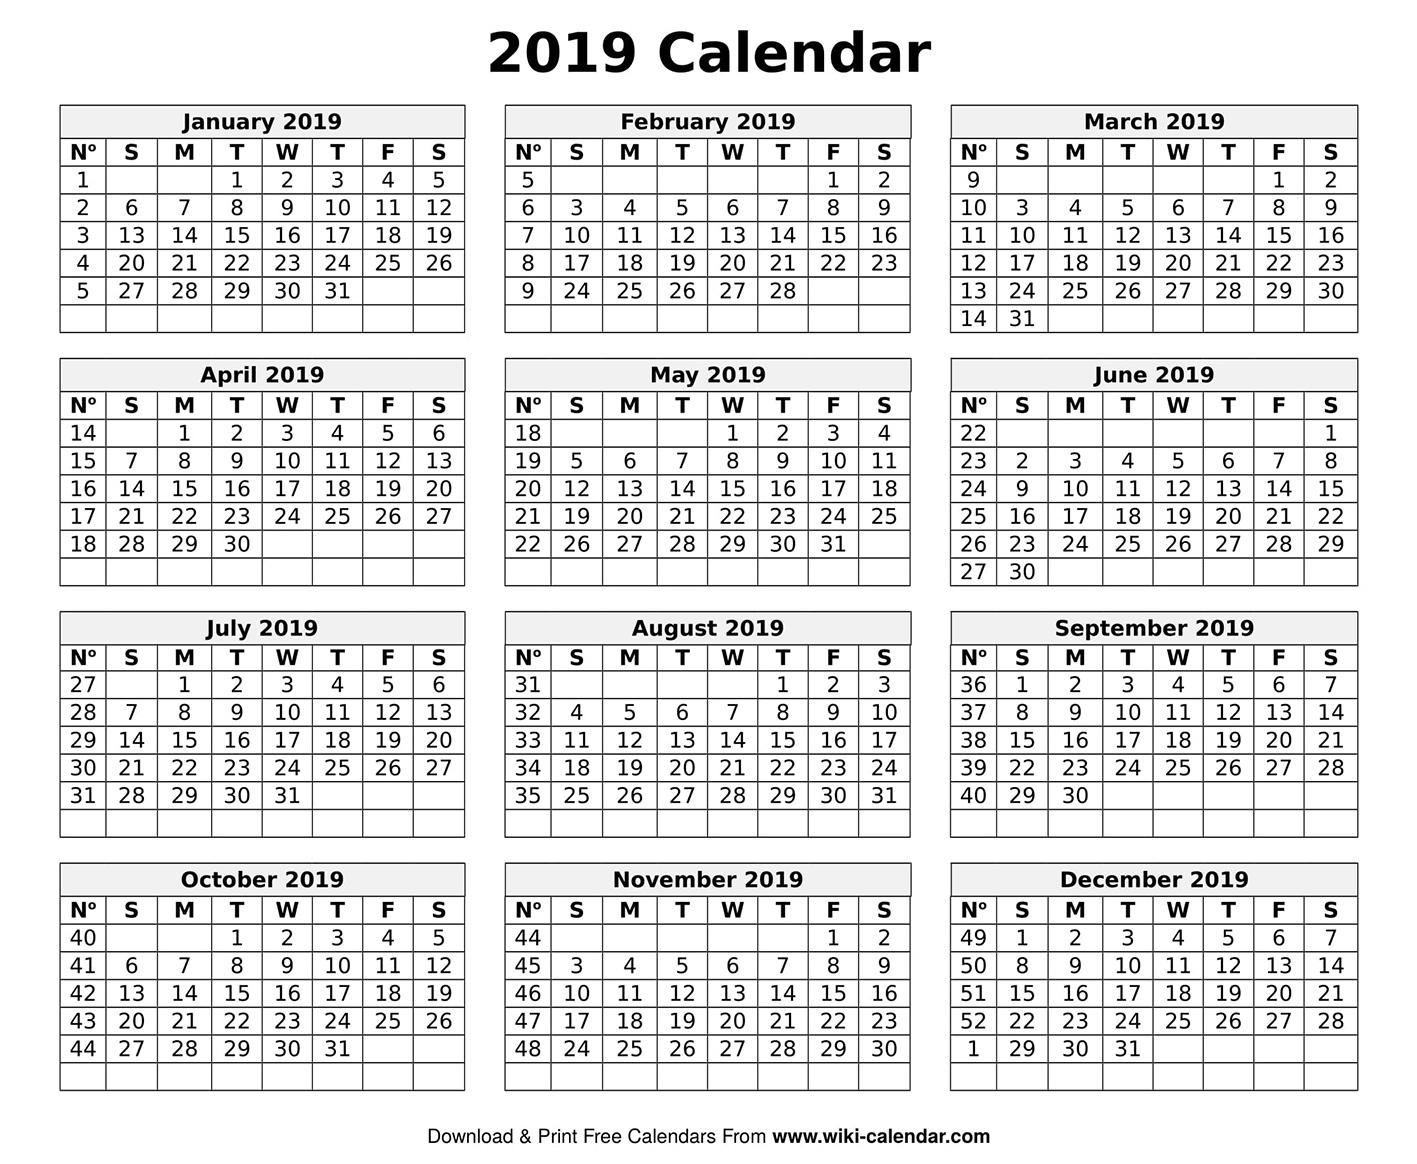 Printable Blank 2019 Calendar Templates Print At Home Calendar Templates